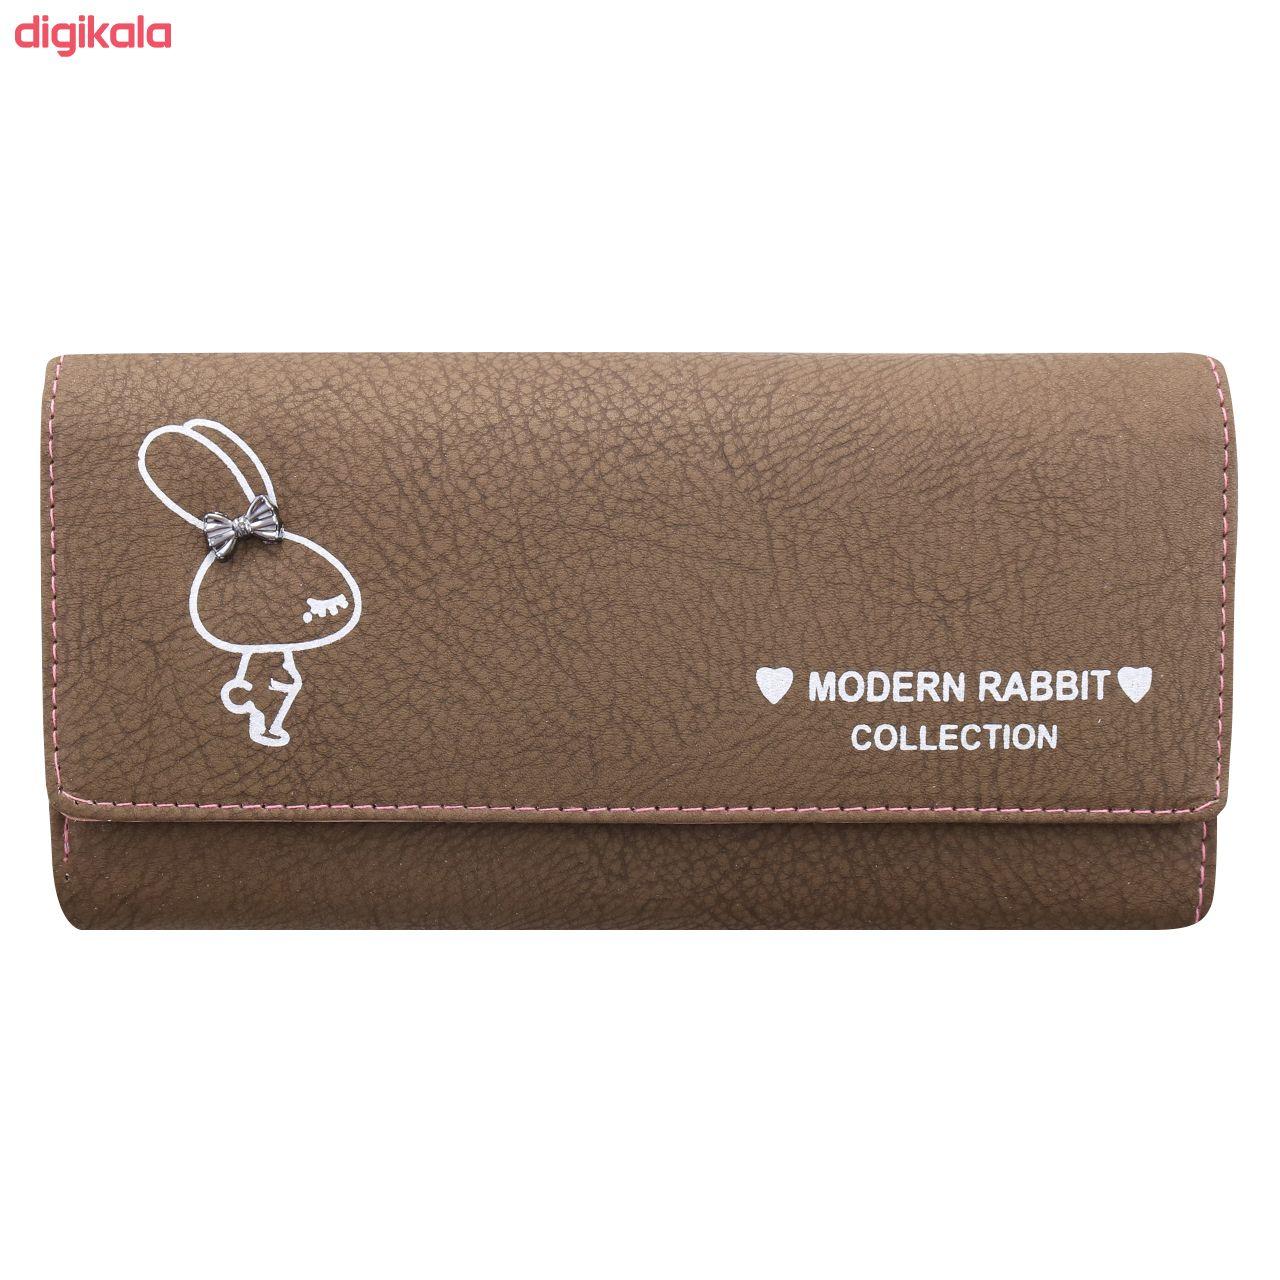 کیف پول زنانه طرح خرگوش کد BG 33 main 1 1